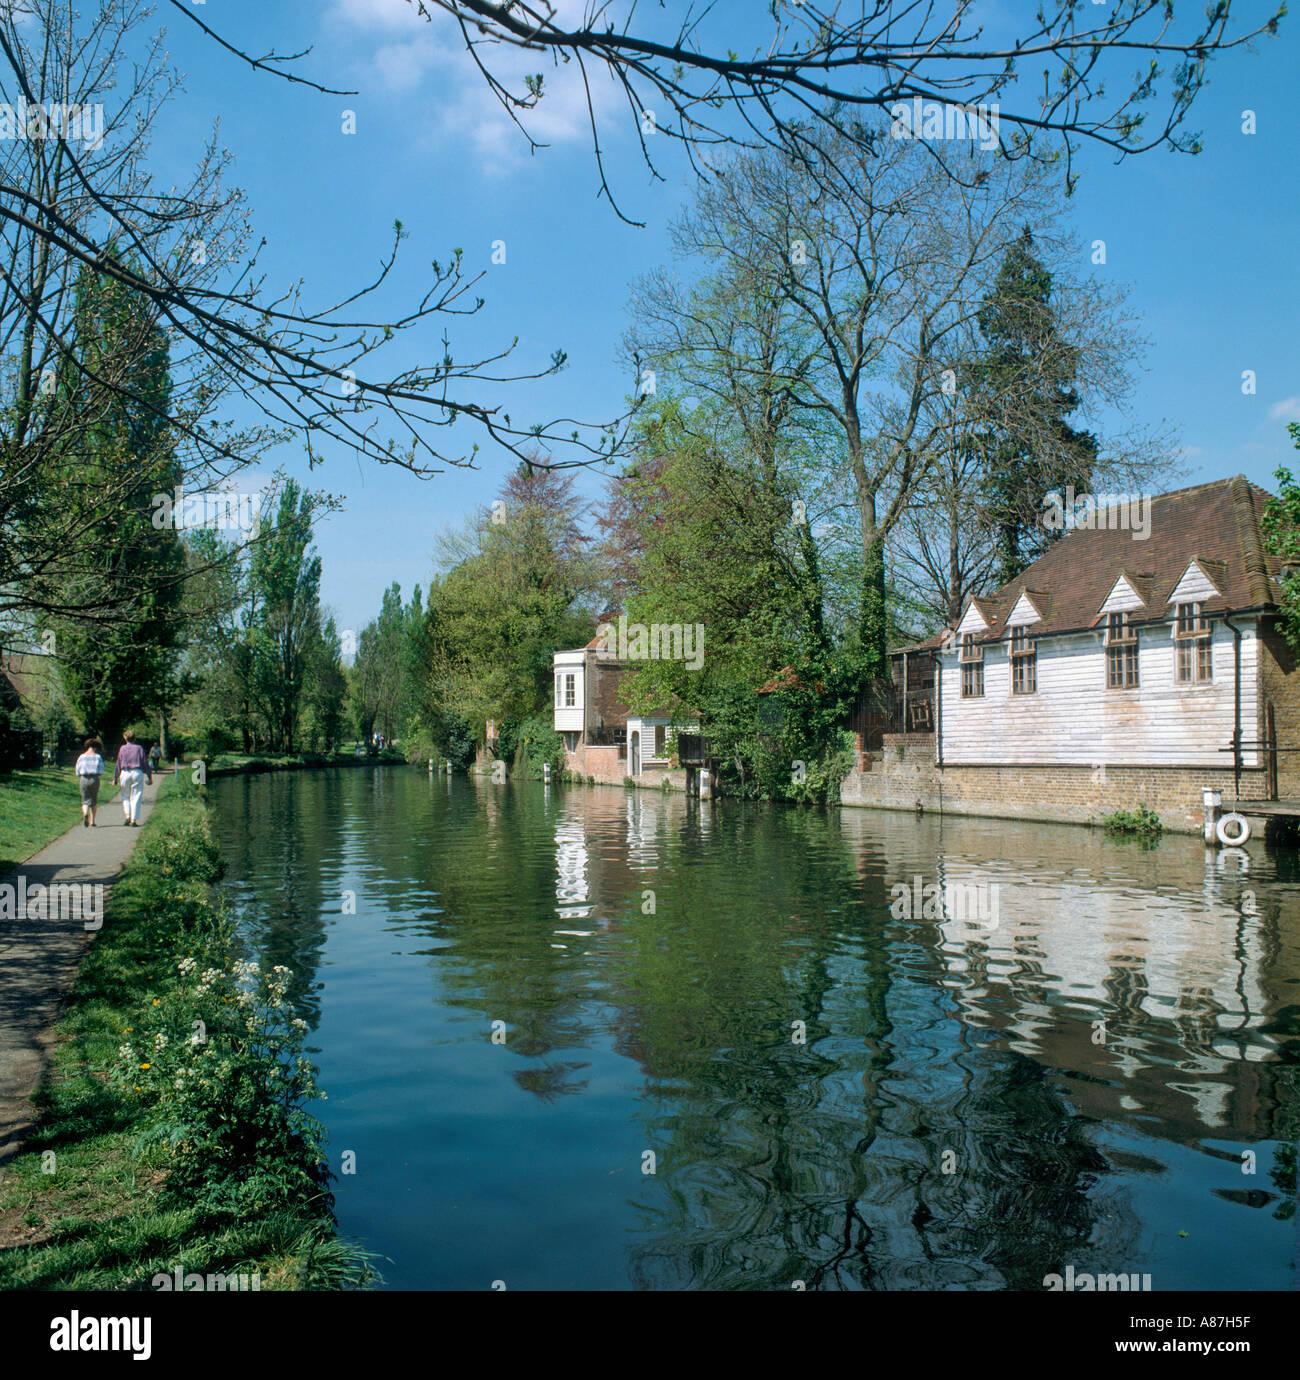 River Lea in Spring, Ware, Hertfordshire, United Kingdom - Stock Image